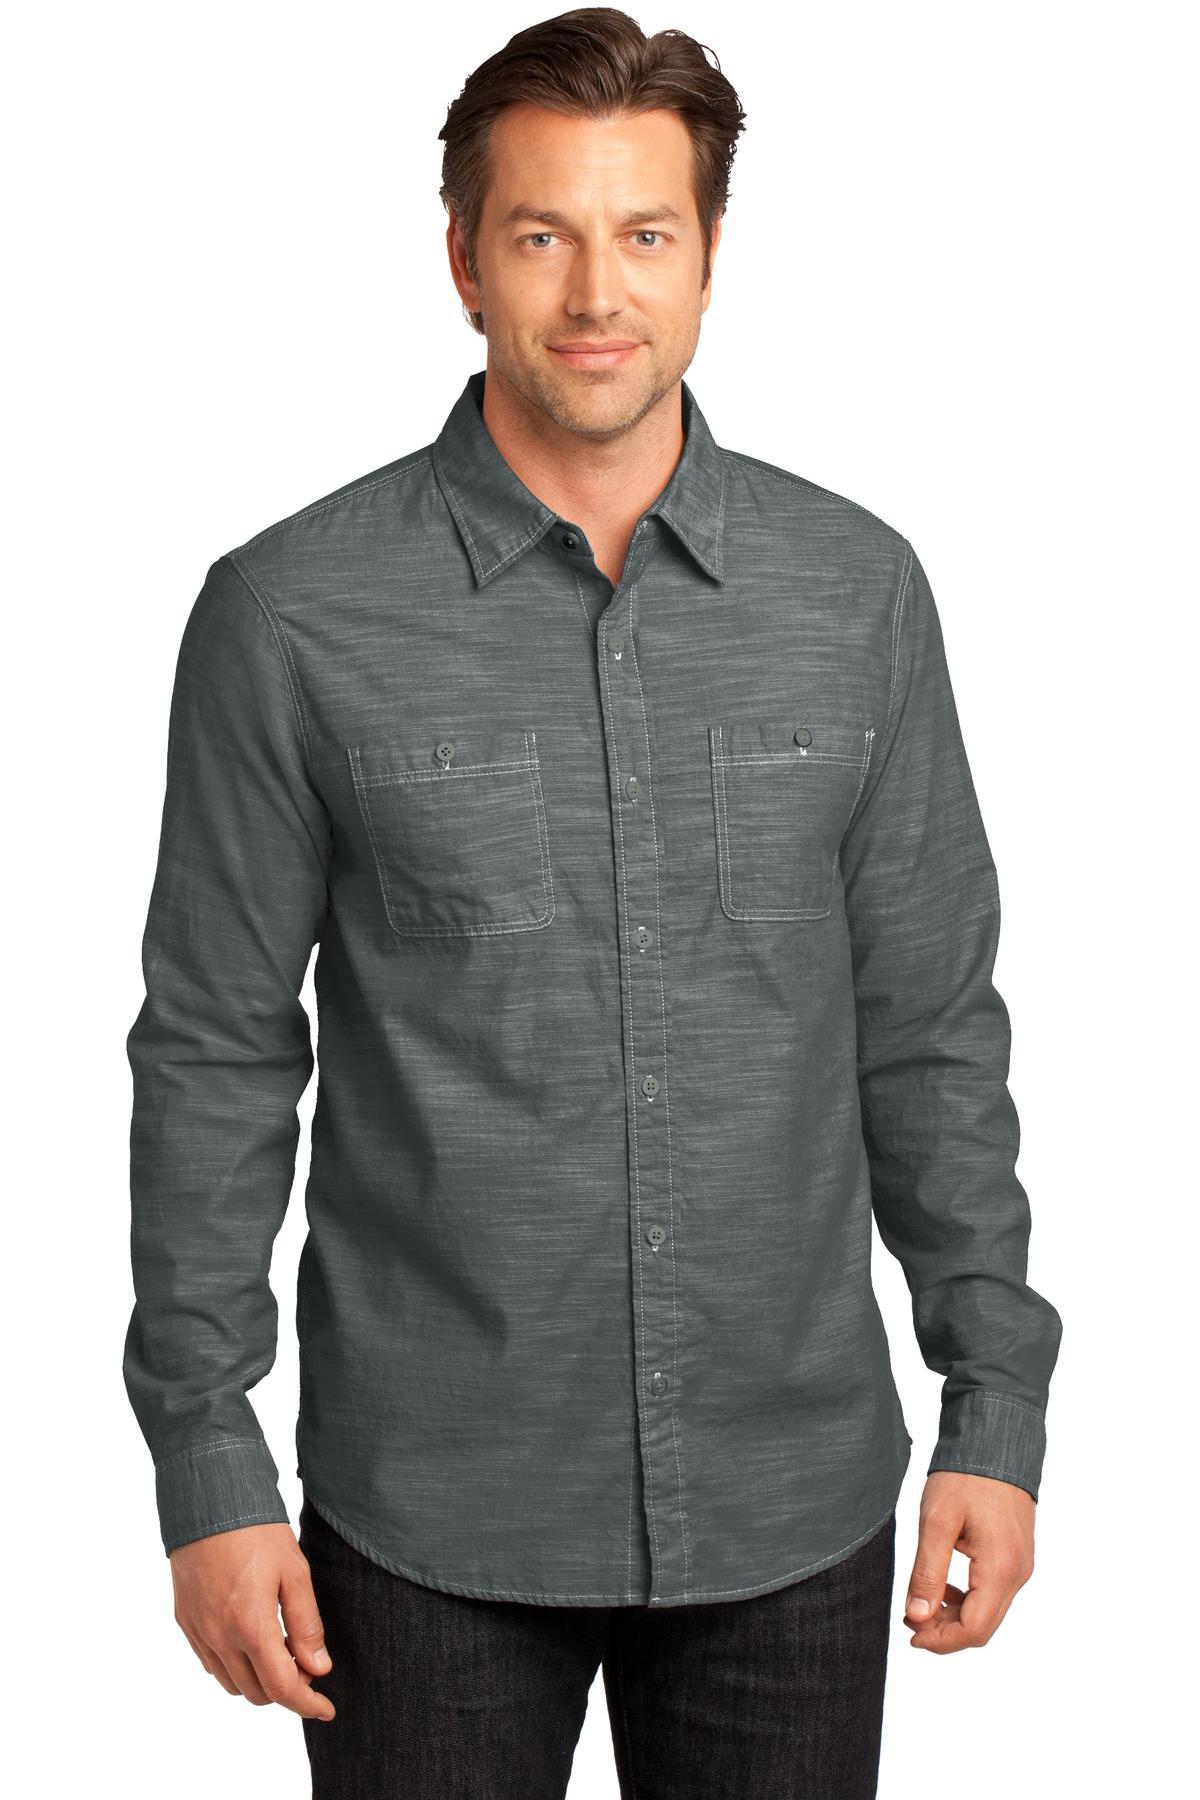 Woven-Shirts-Cotton-1